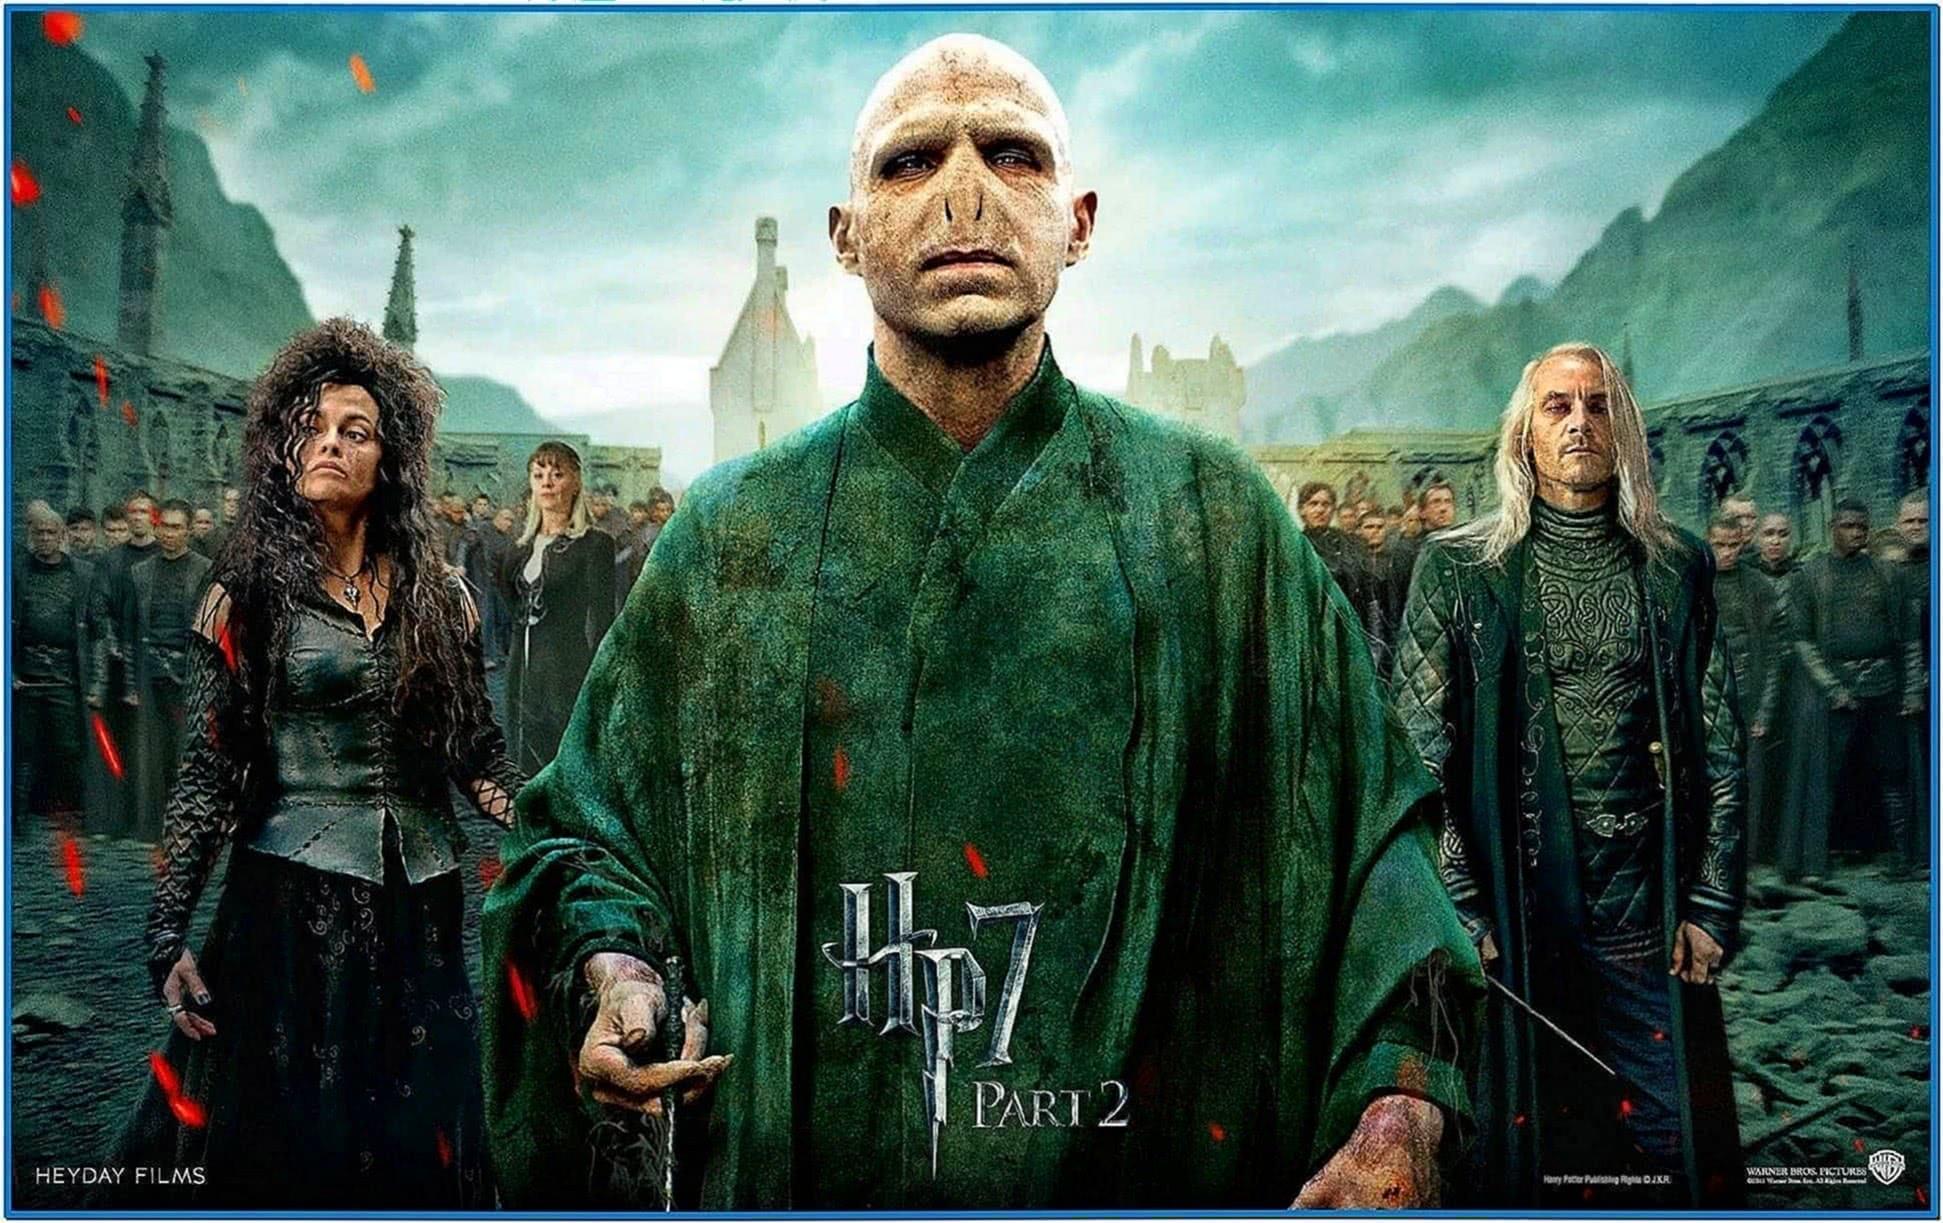 Harry Potter Deathly Hallows Screensaver Mac